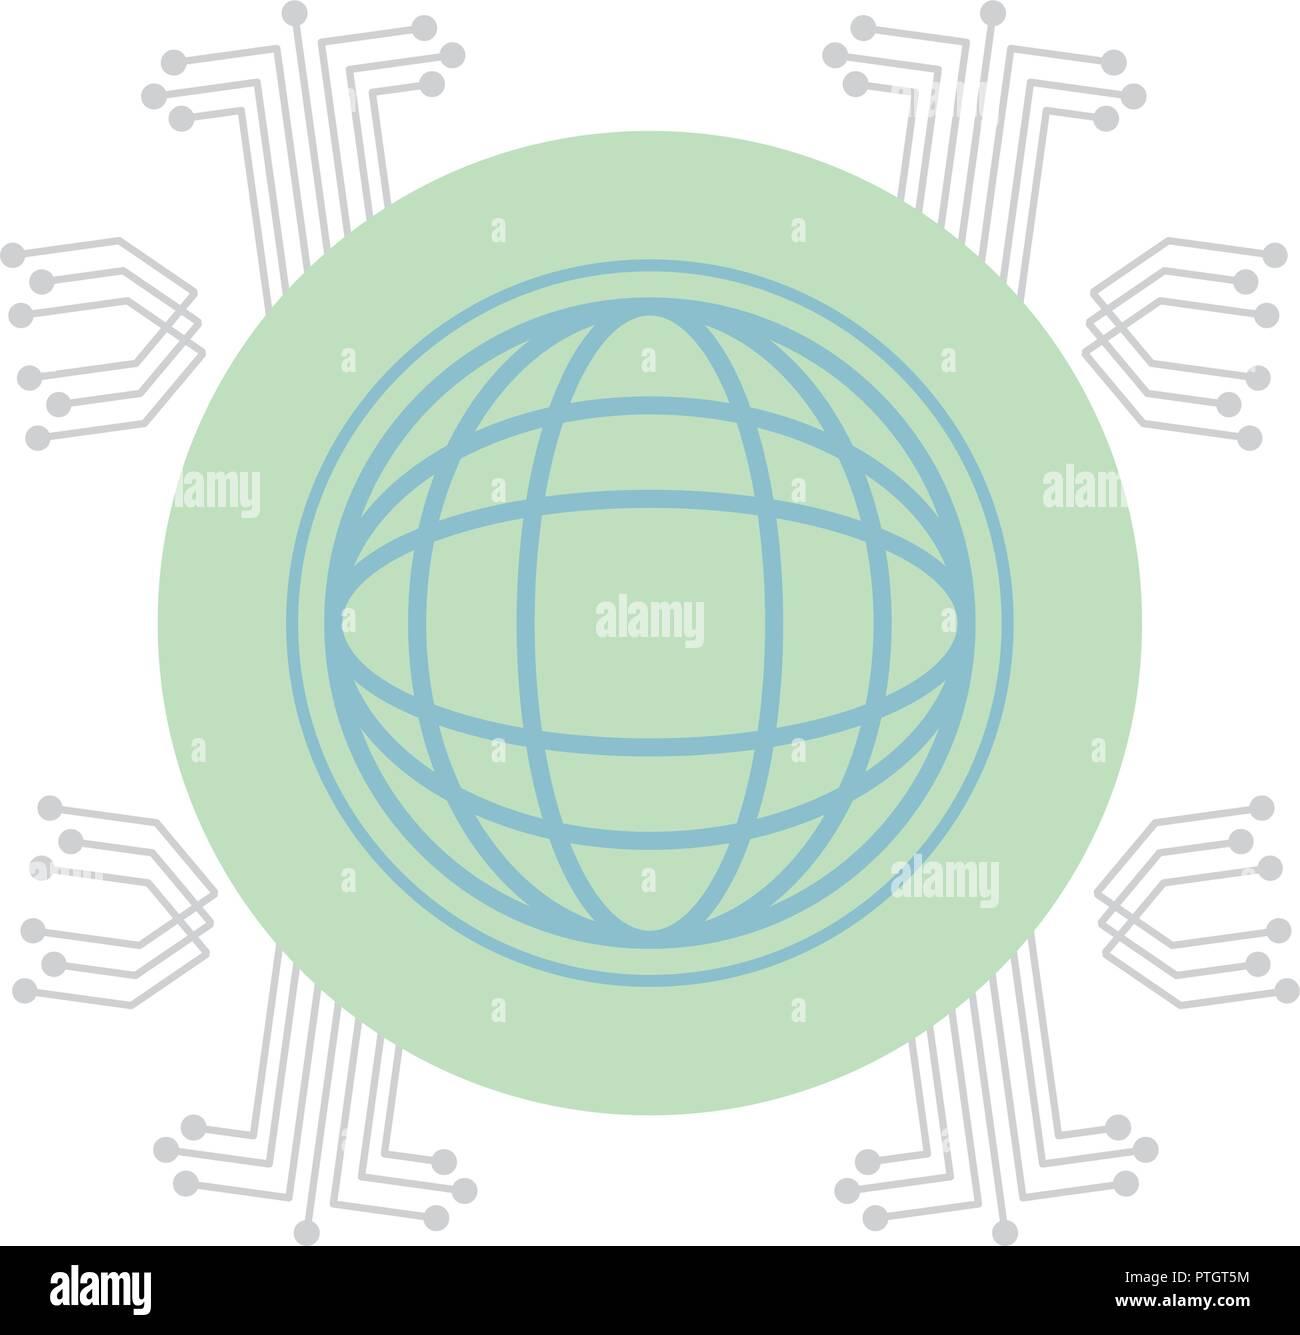 Global sphere symbol - Stock Image